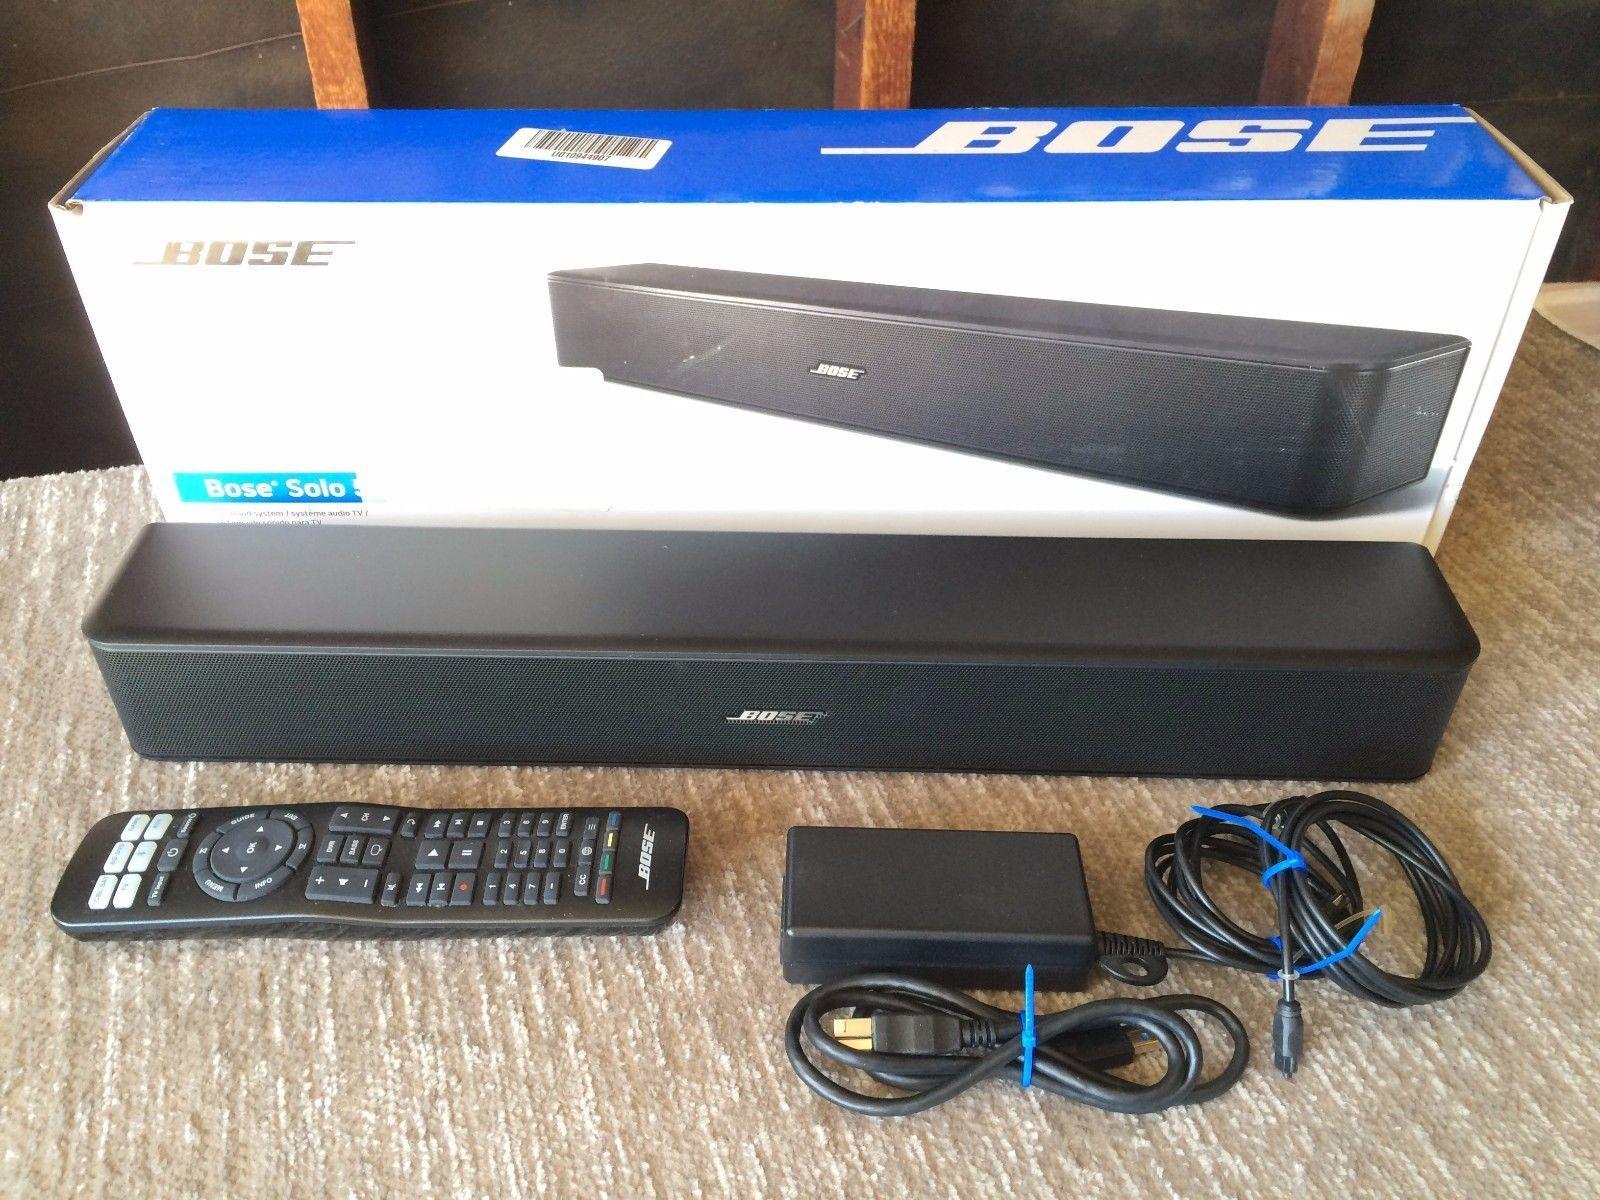 Bose Solo 5 TV Speakers